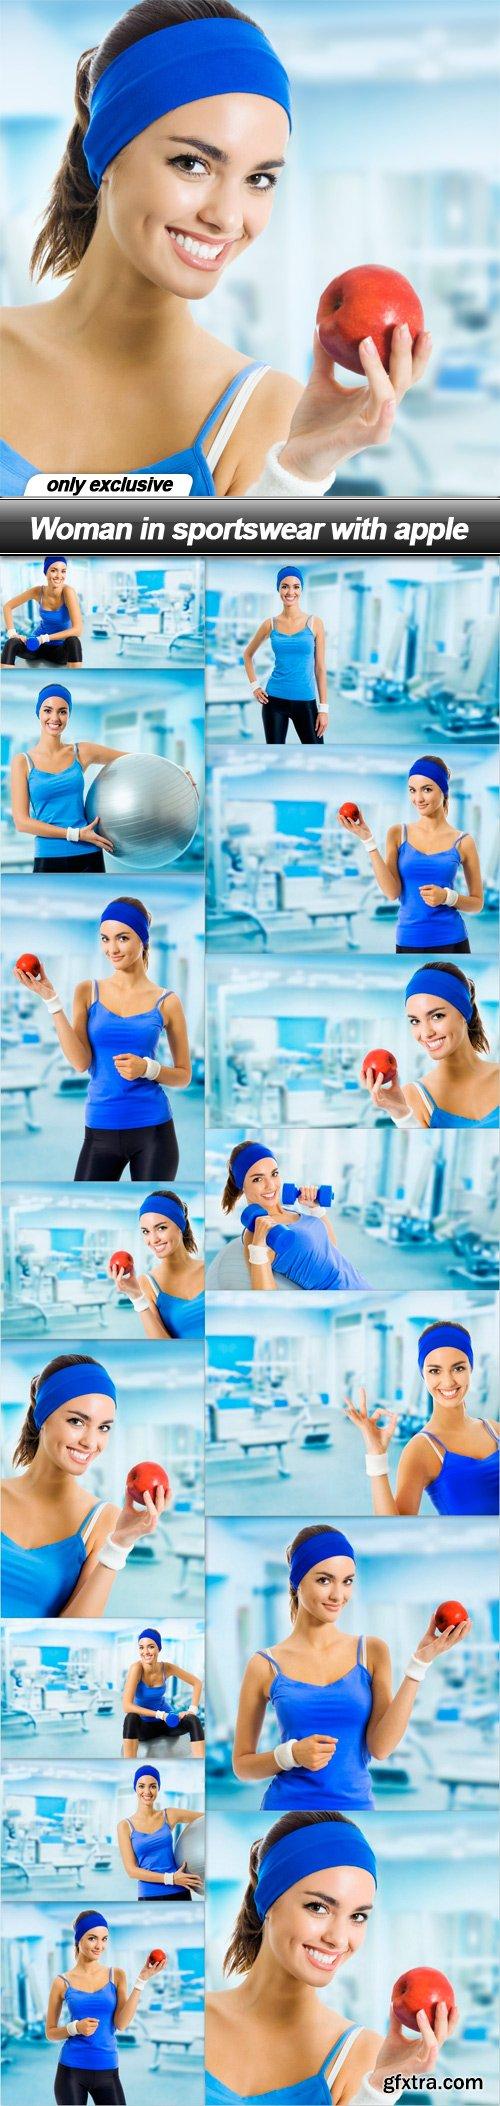 Woman in sportswear with apple - 15 UHQ JPEG